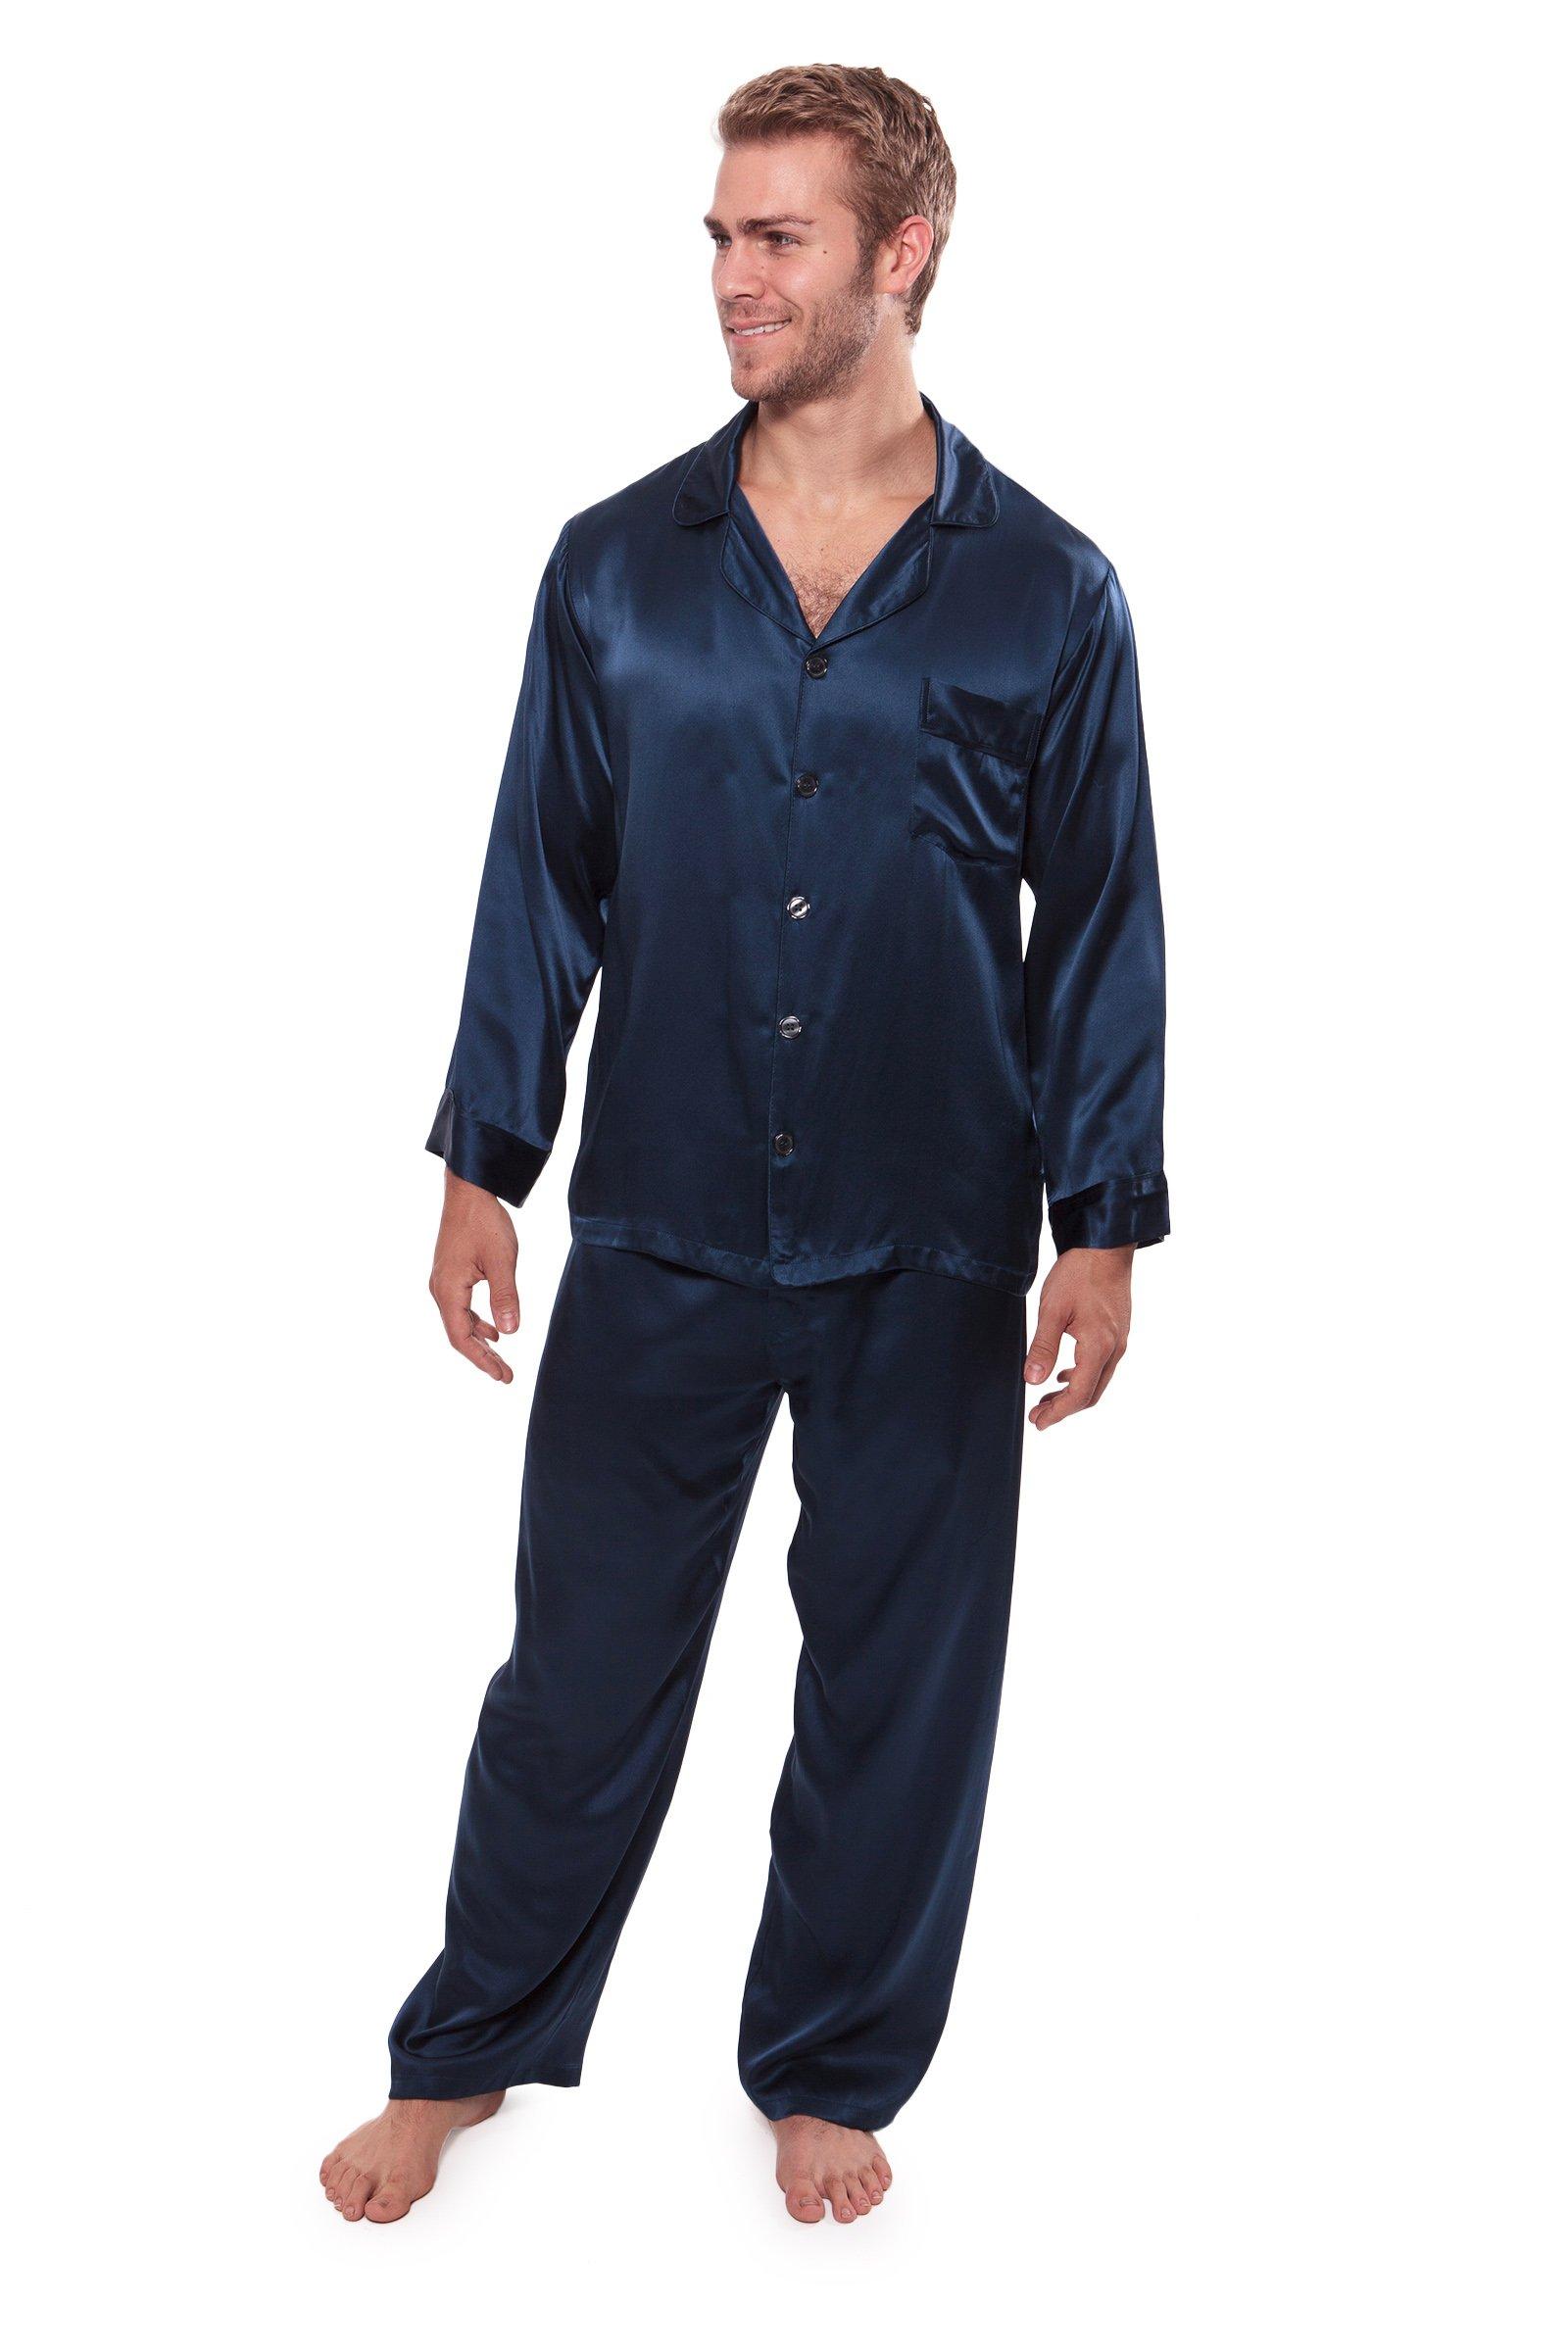 TexereSilk Men's 100% Silk Pajama Set - Luxury Nightwear Pajamas by (Milaroma, Midnight Blue, Large) Special Gifts From Wife MS0001-MID-L